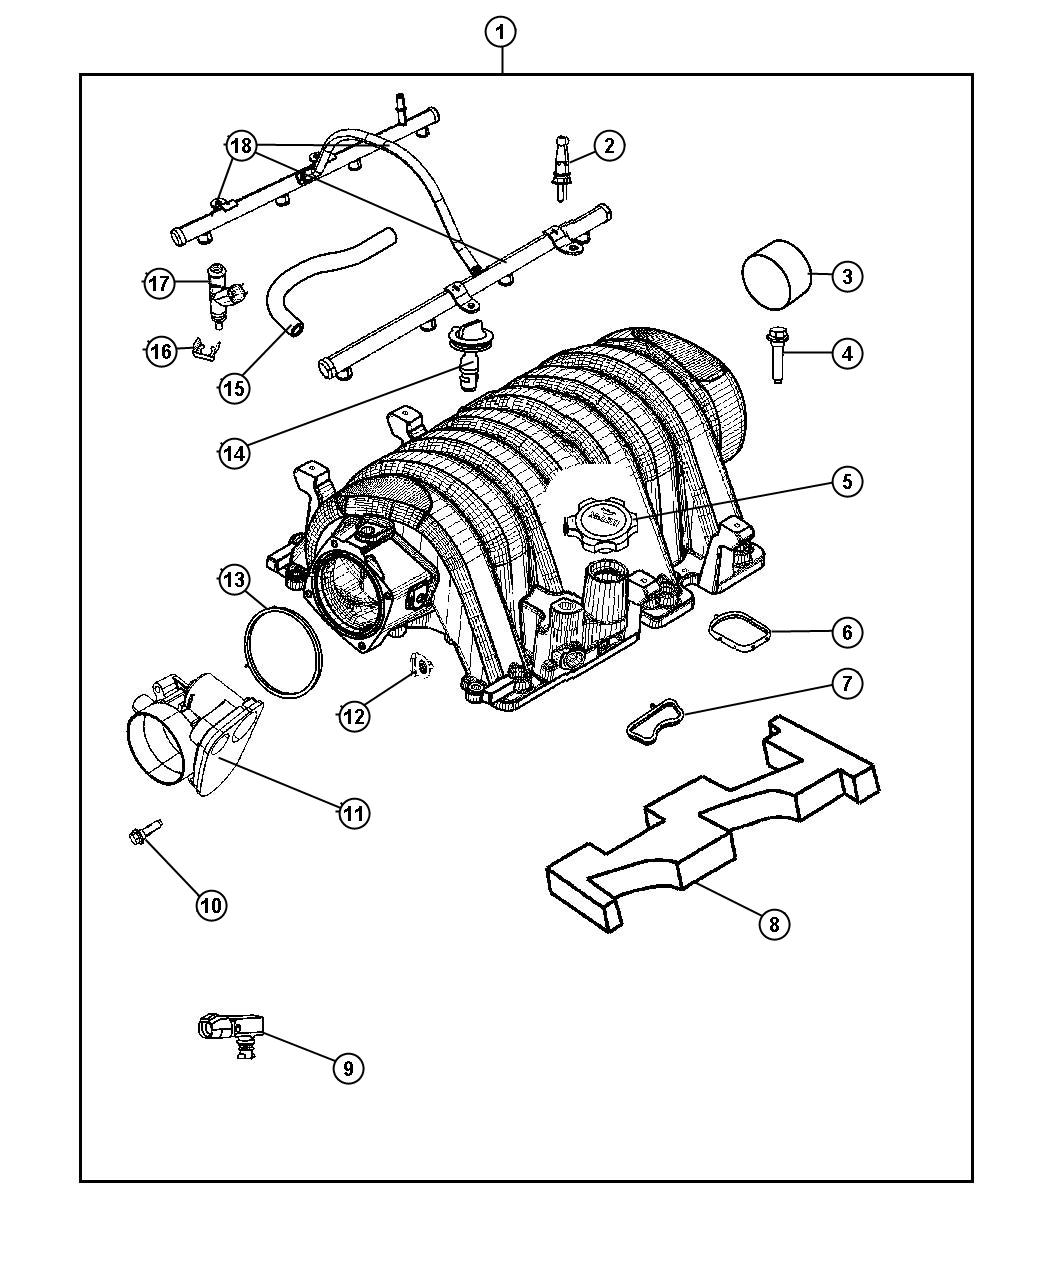 2006 Dodge Charger R/T 5.7L Hemi V8 Manifold. Intake